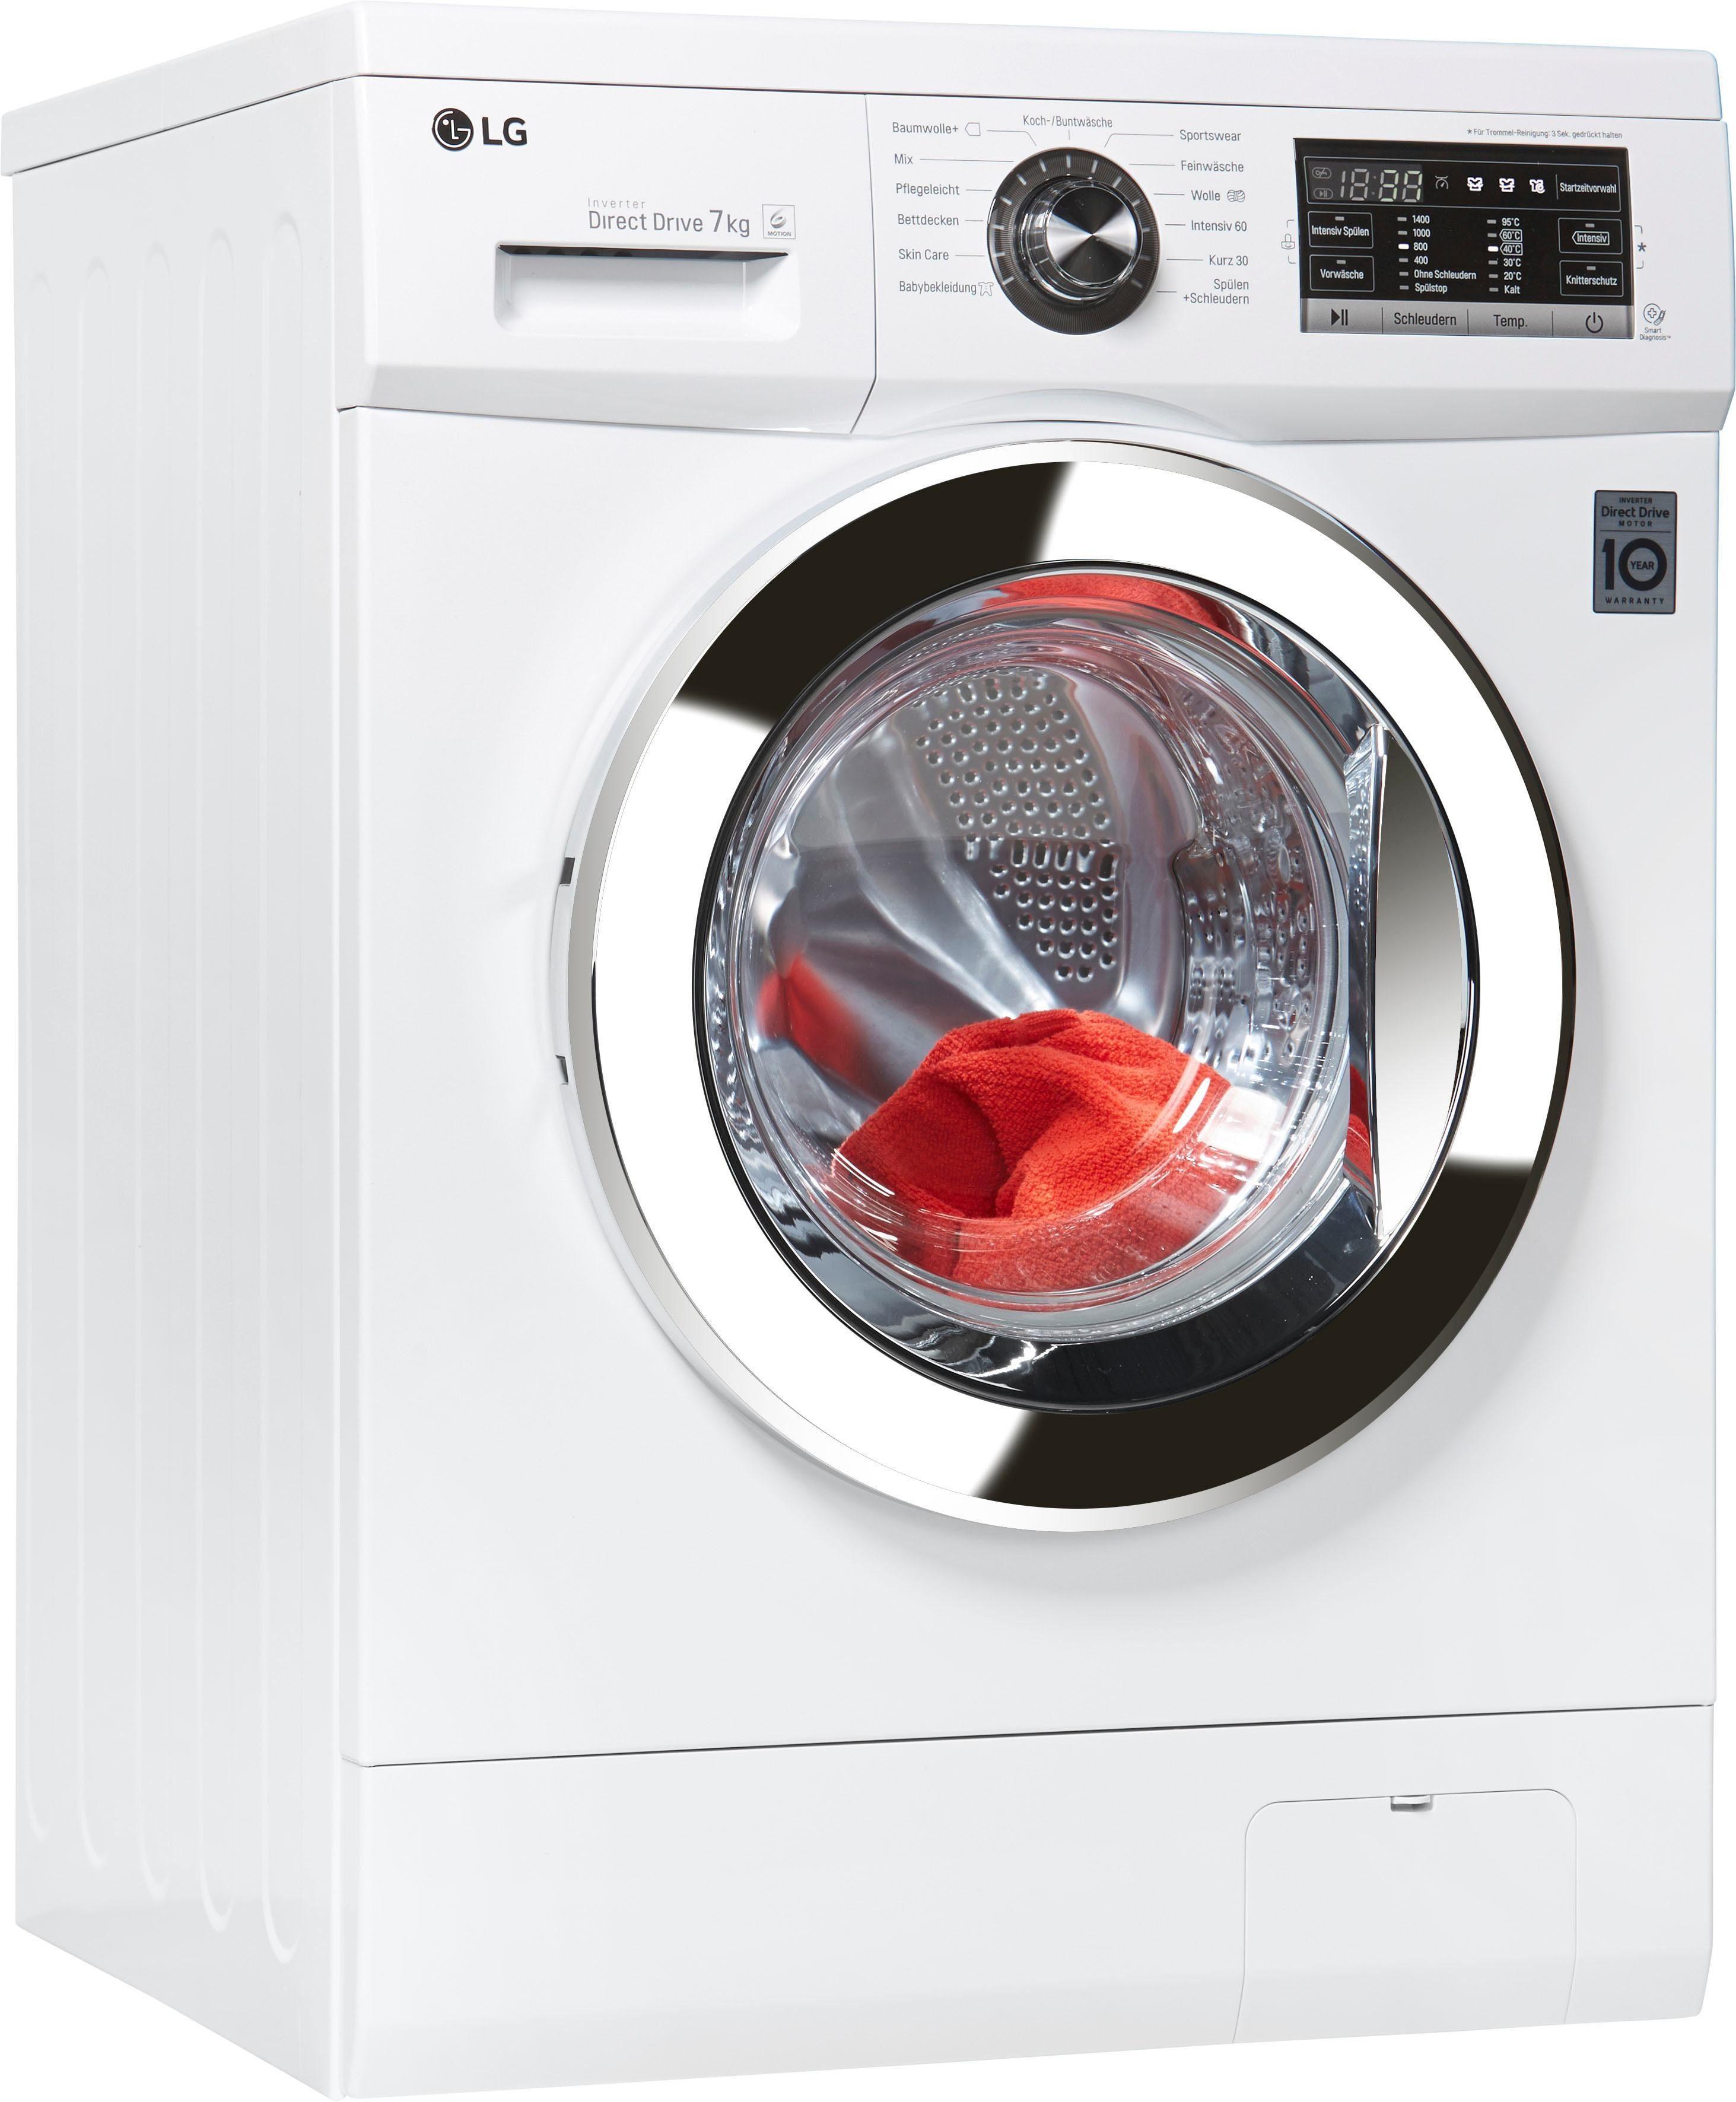 LG Waschmaschine F1496QD3H, 7 kg, 1400 U/Min, unterbaufähig